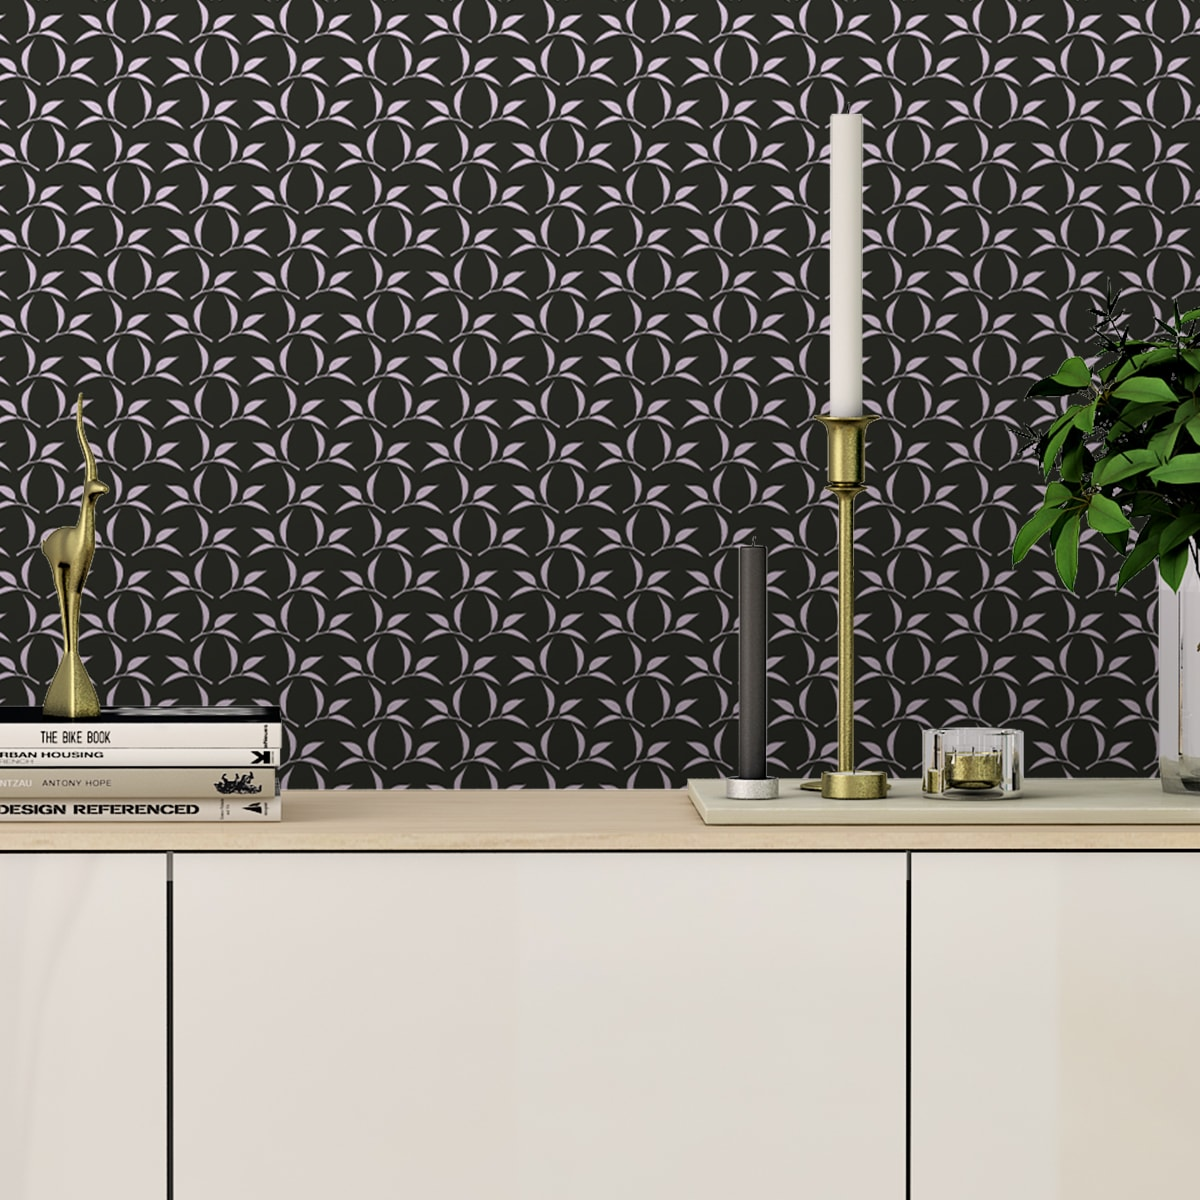 Tee Blatt Ornamenttapete Tea Time in schwarz - Design Tapete für Flur, Büro 2